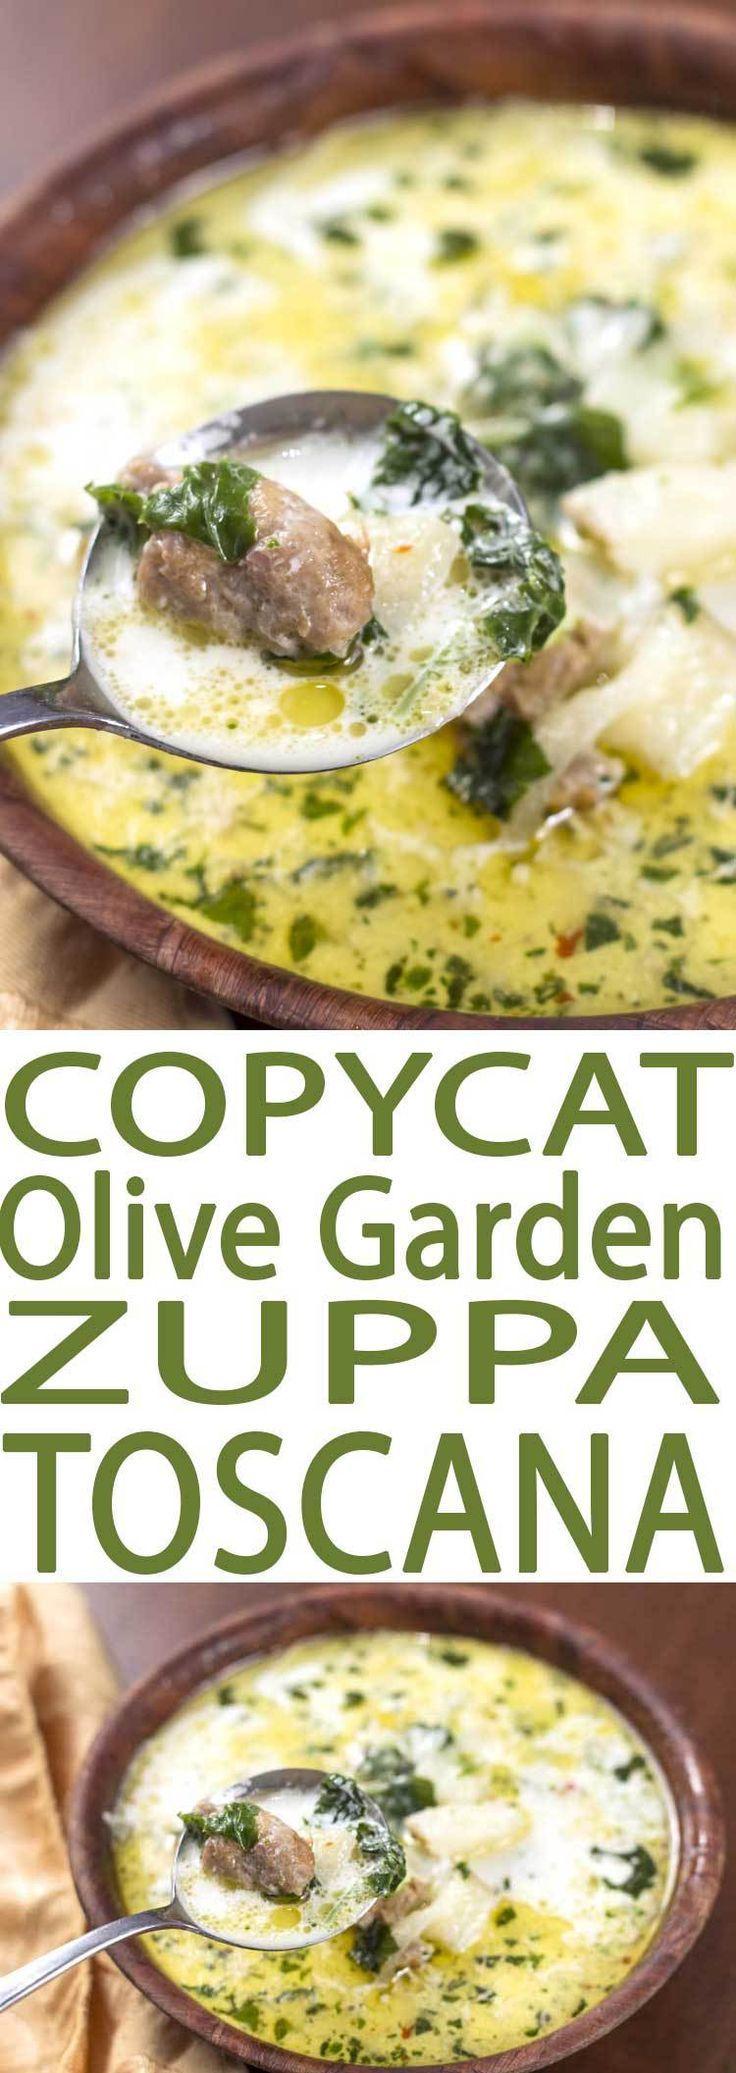 Copycat olive garden zuppa toscana soup recipe olive - Olive garden zuppa toscana copycat ...